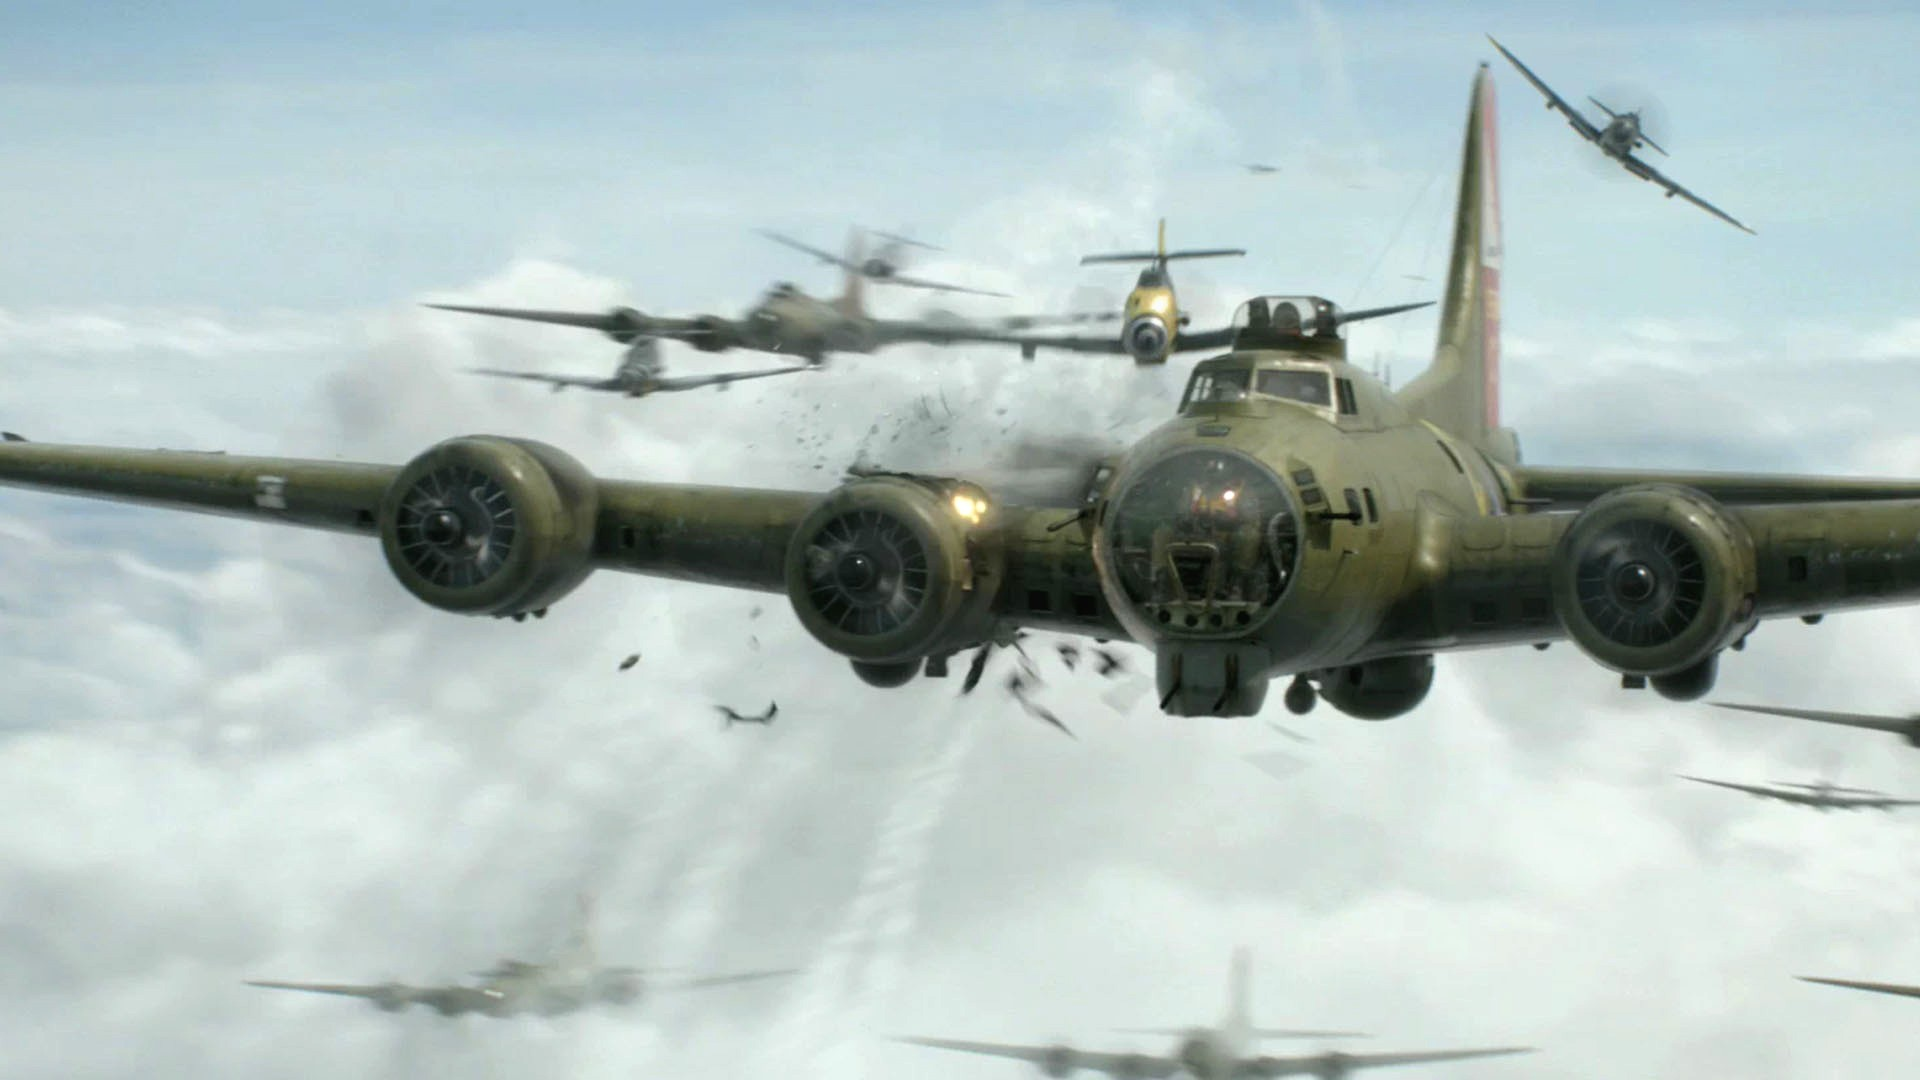 Boeing B 17 Flying Fortress Wallpaper 10   1920 X 1080 stmednet 1920x1080